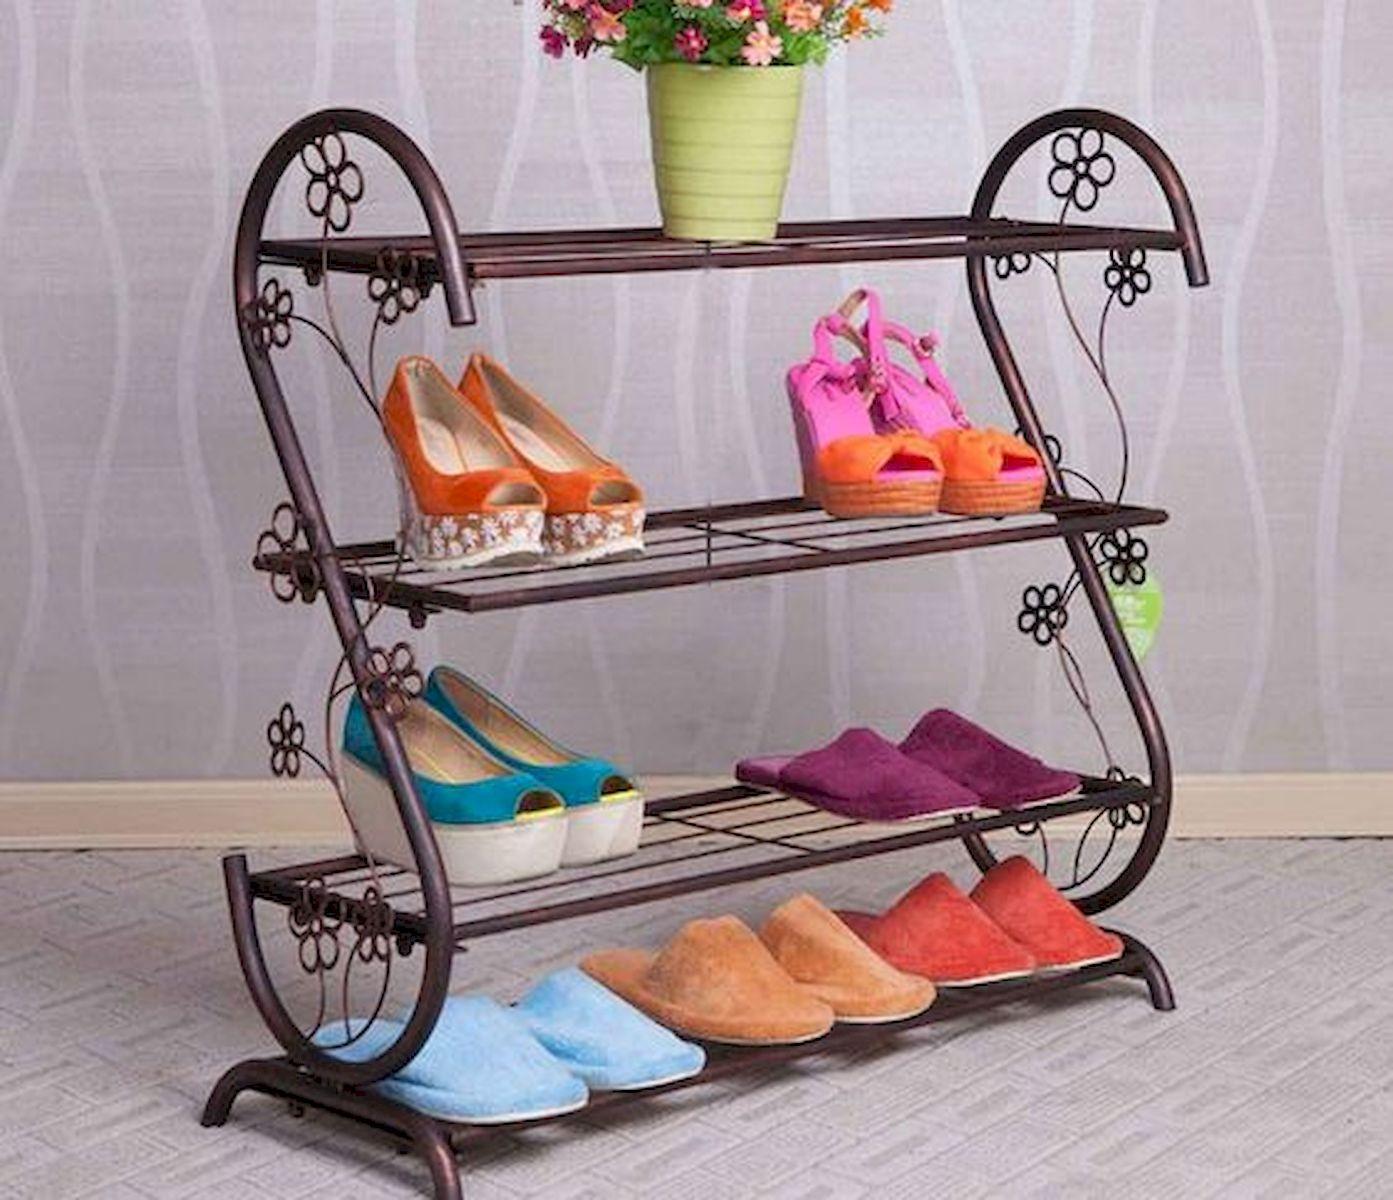 50 Fantastic DIY Shoes Rack Design Ideas (35)